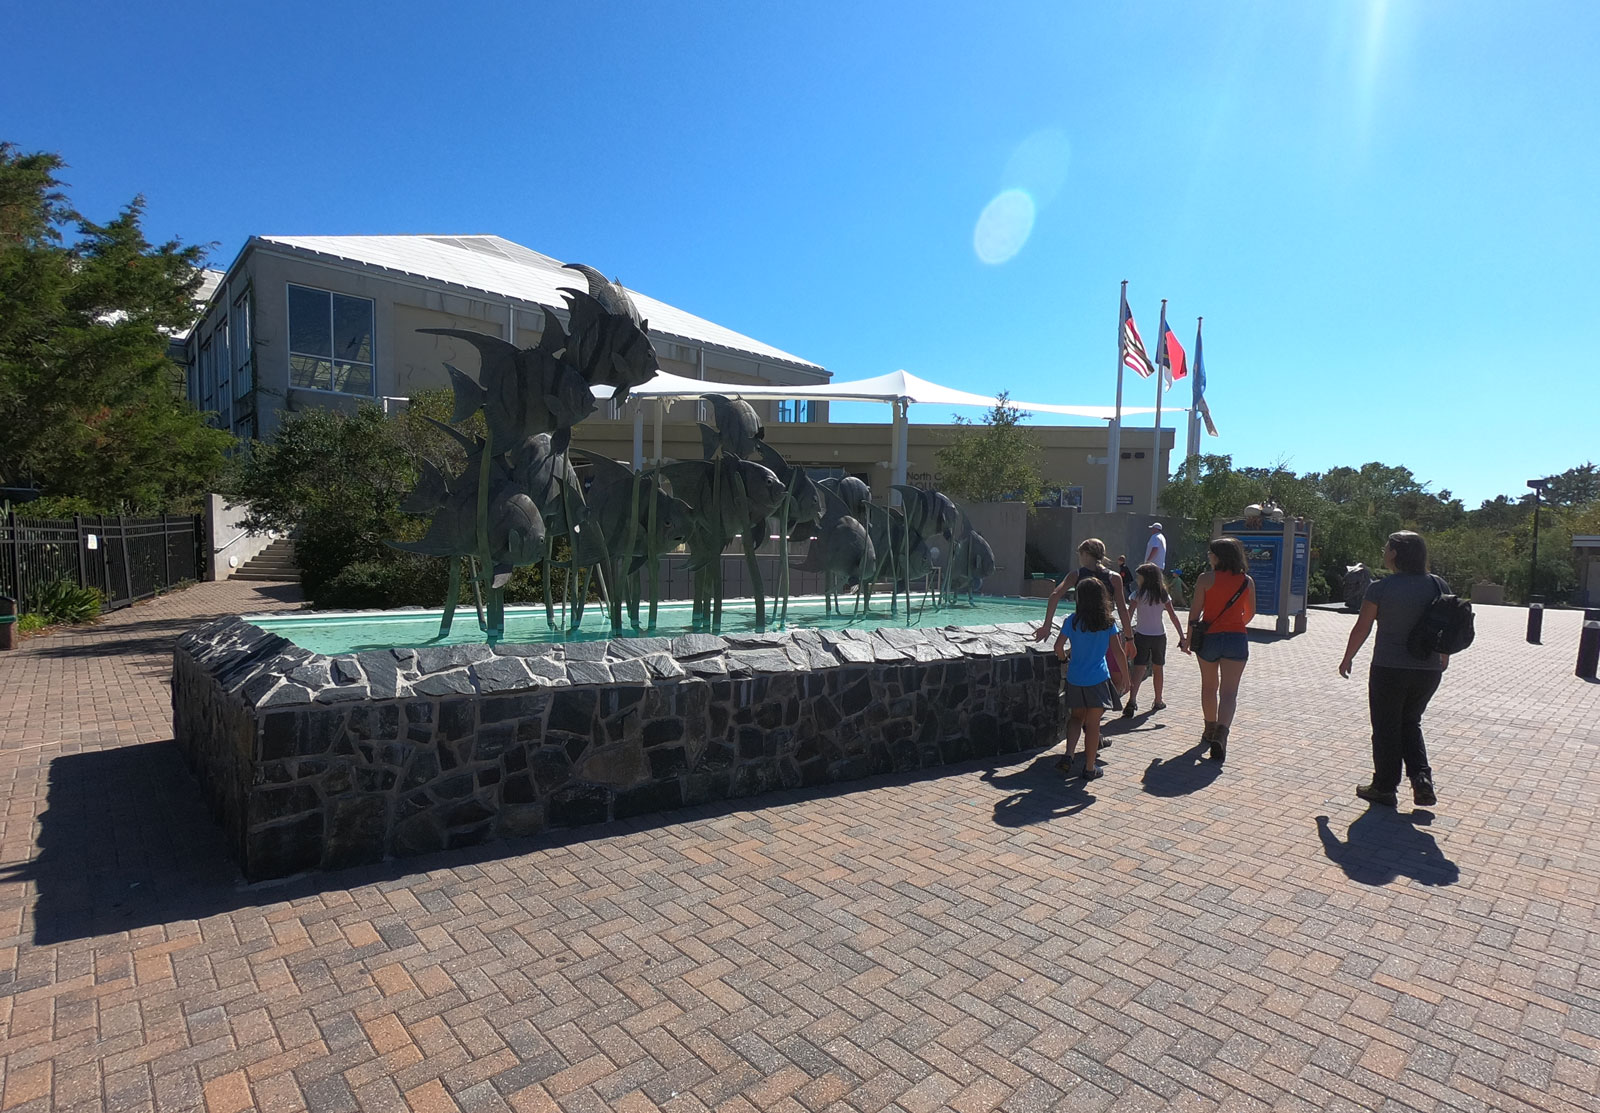 The North Carolina Aquarium at Fort Fisher